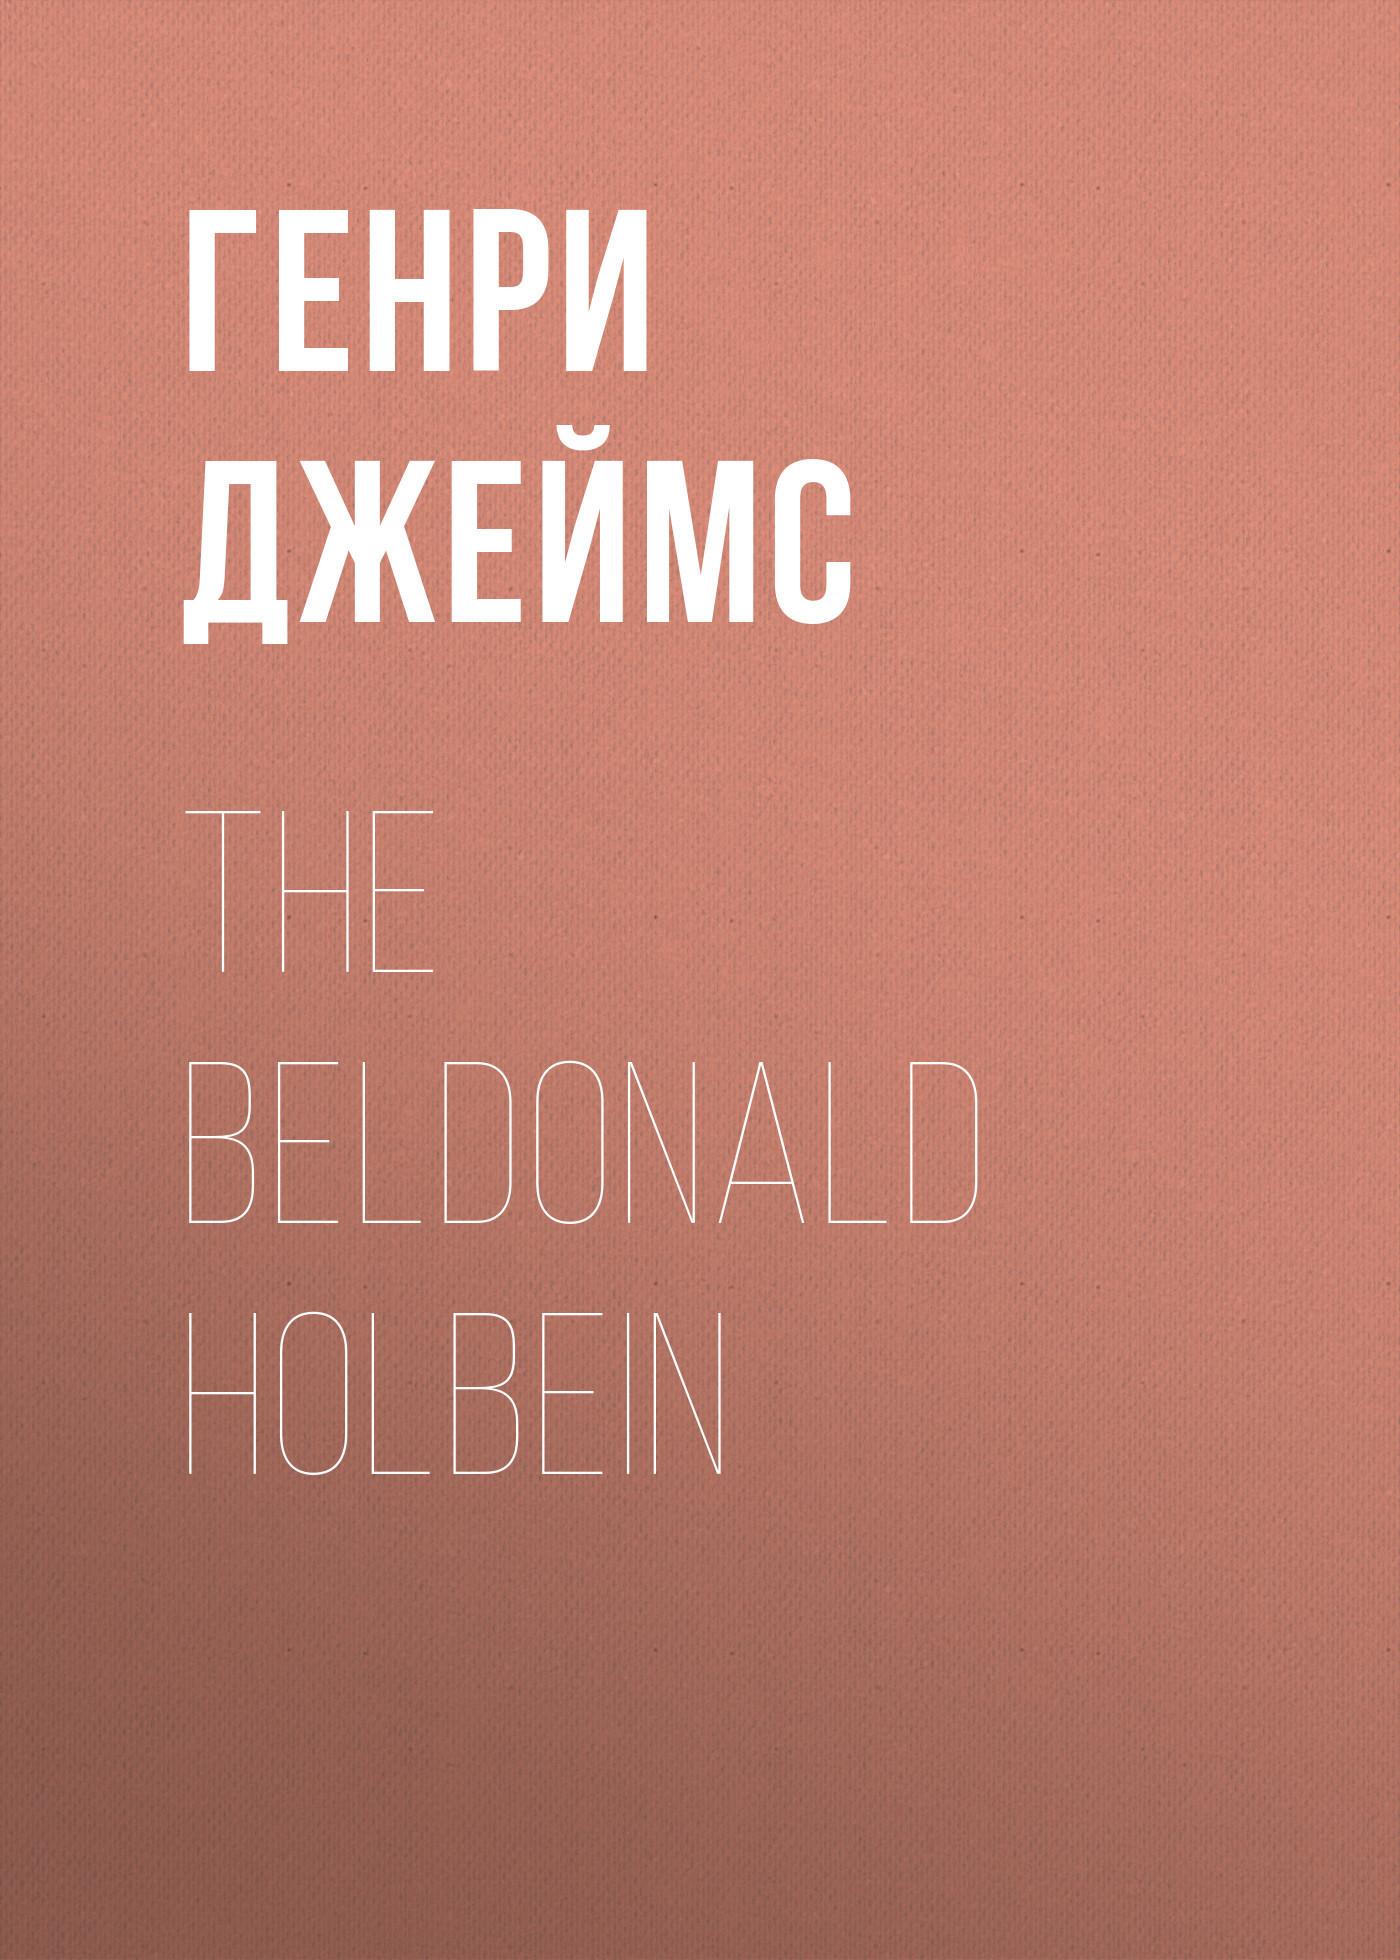 Генри Джеймс The Beldonald Holbein holbein colour library